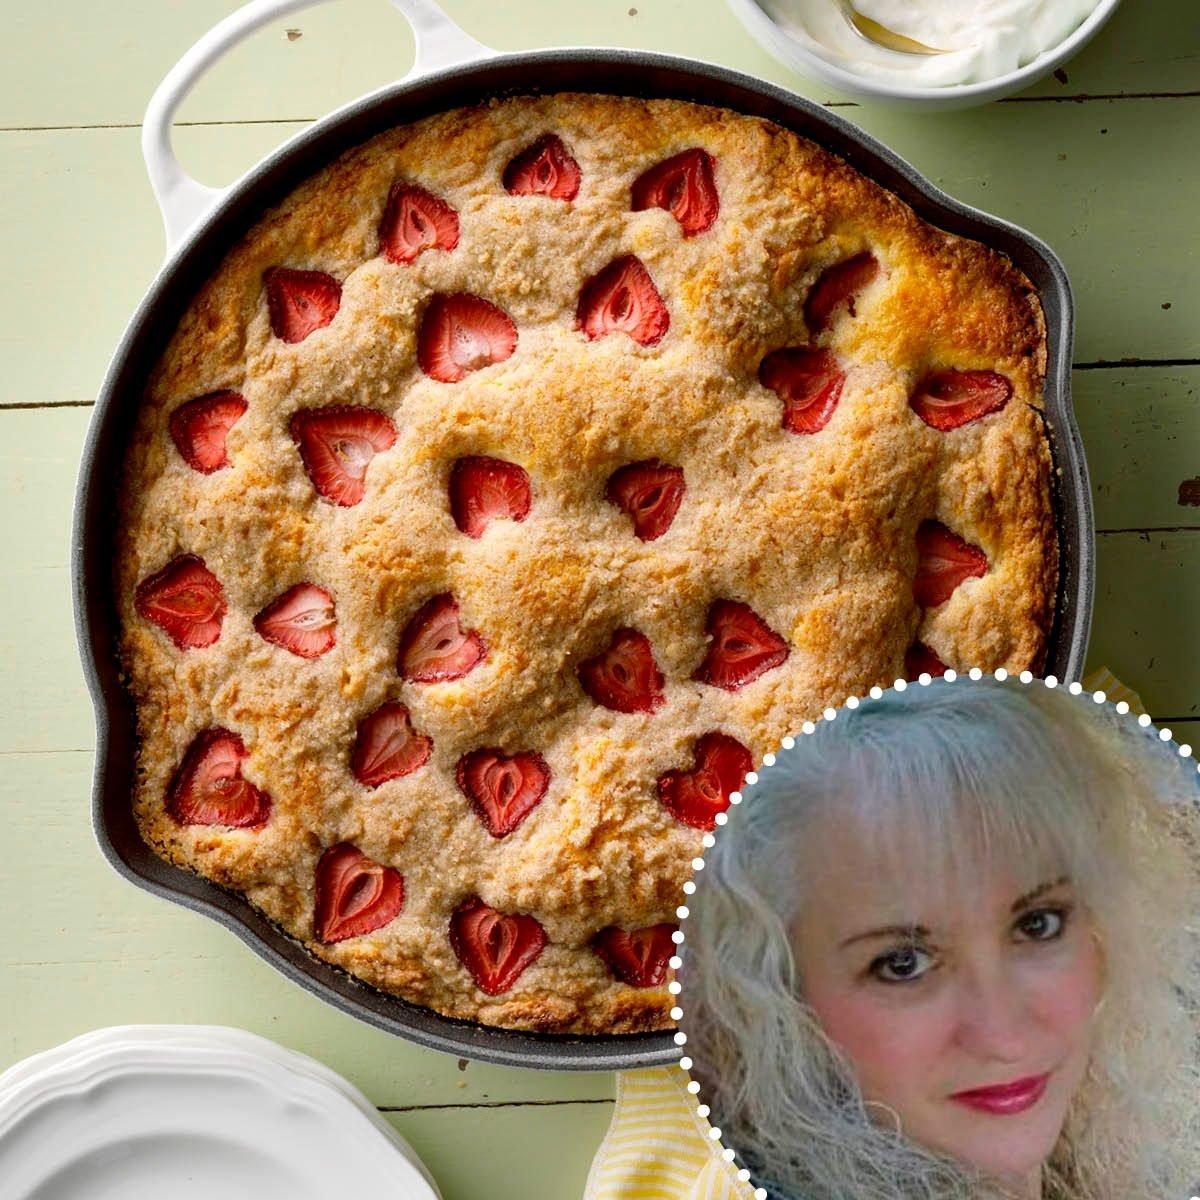 ROTY Claudia Lamascolo Strawberry Buttermilk Skillet Shortcake